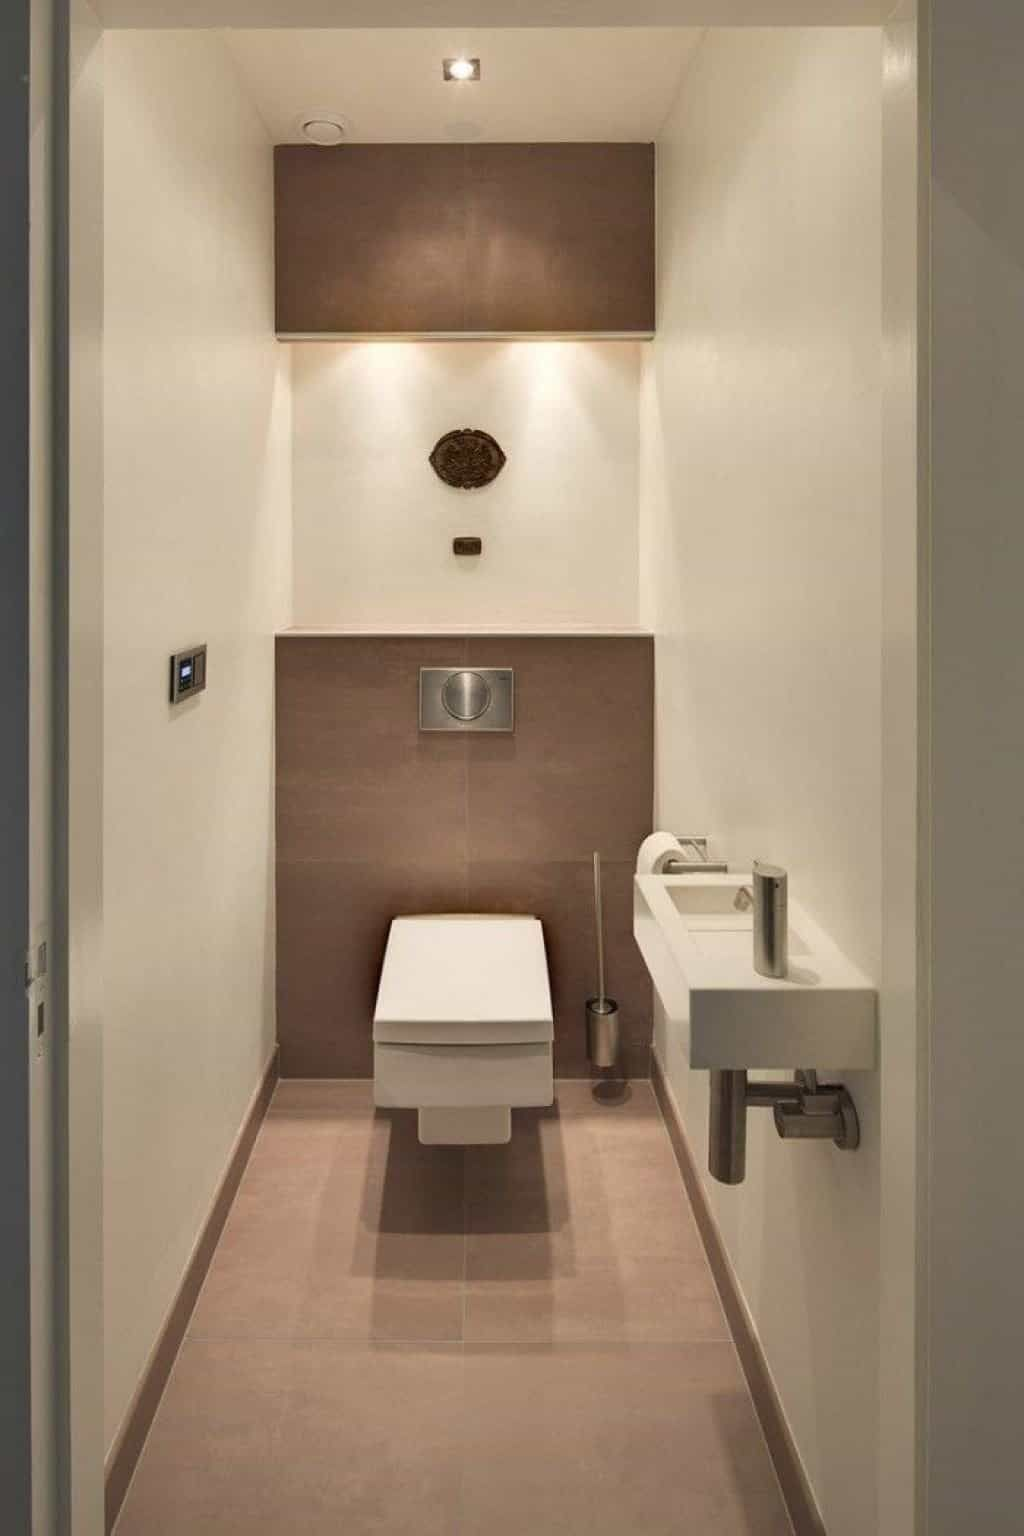 Fix Your Clogged Bathroom Toilet Bathroom Design Small Modern Toilet Toilet Design